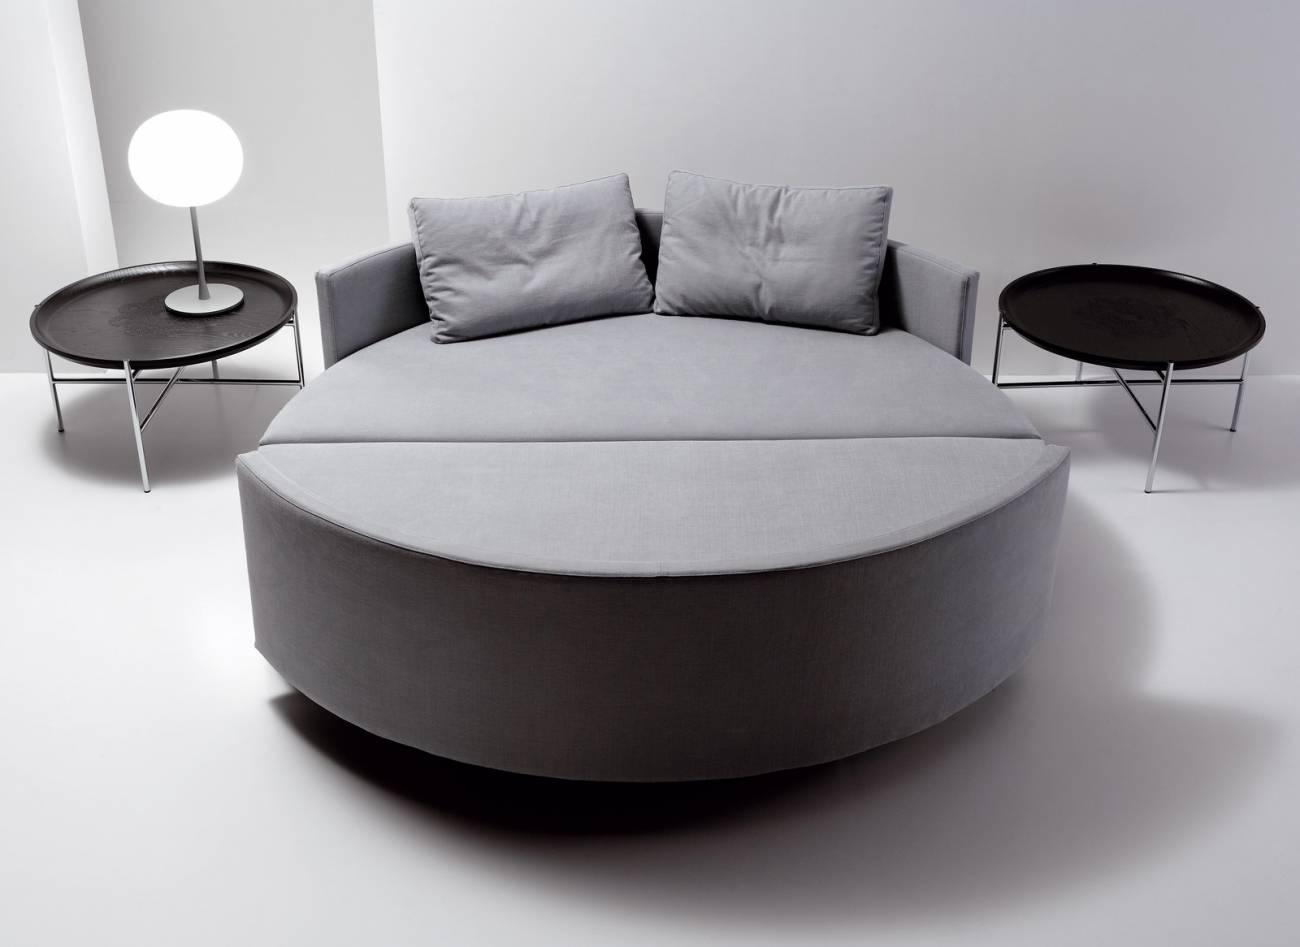 the-scoop-bed